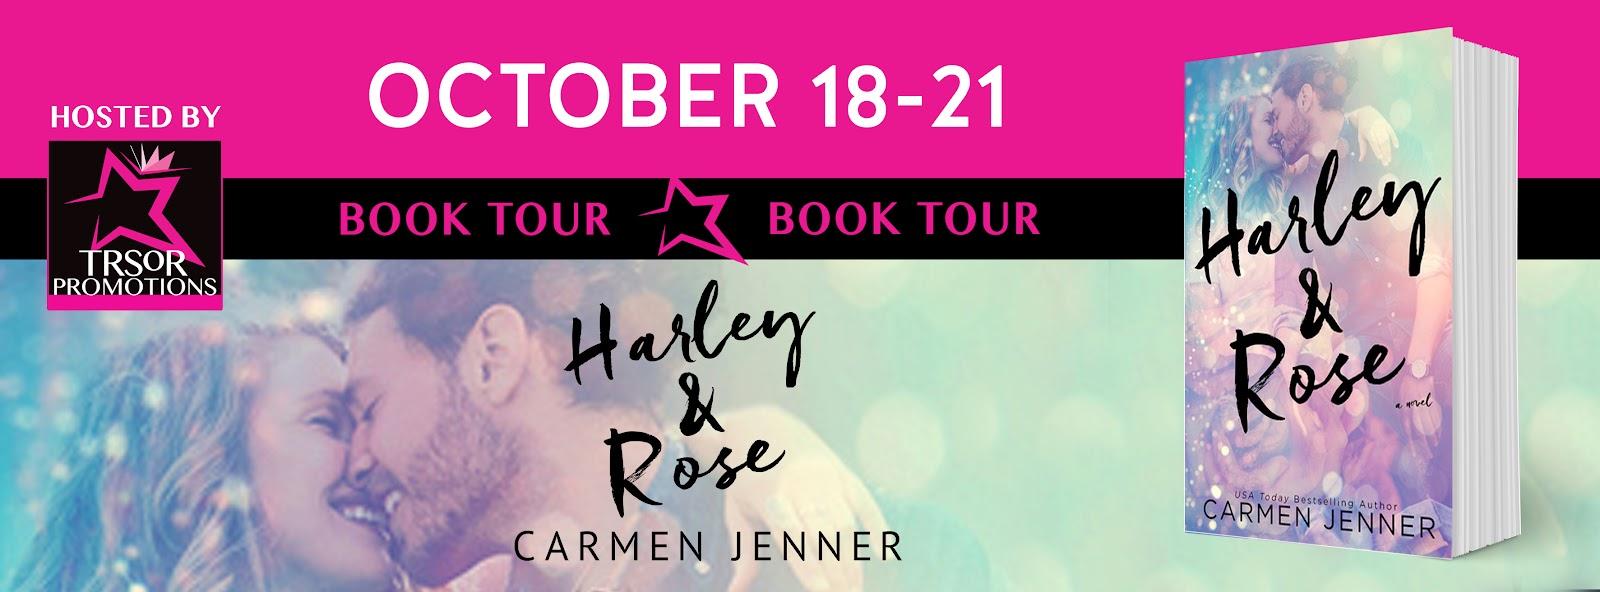 HARLEY_ROSE_BOOK_TOUR.jpg